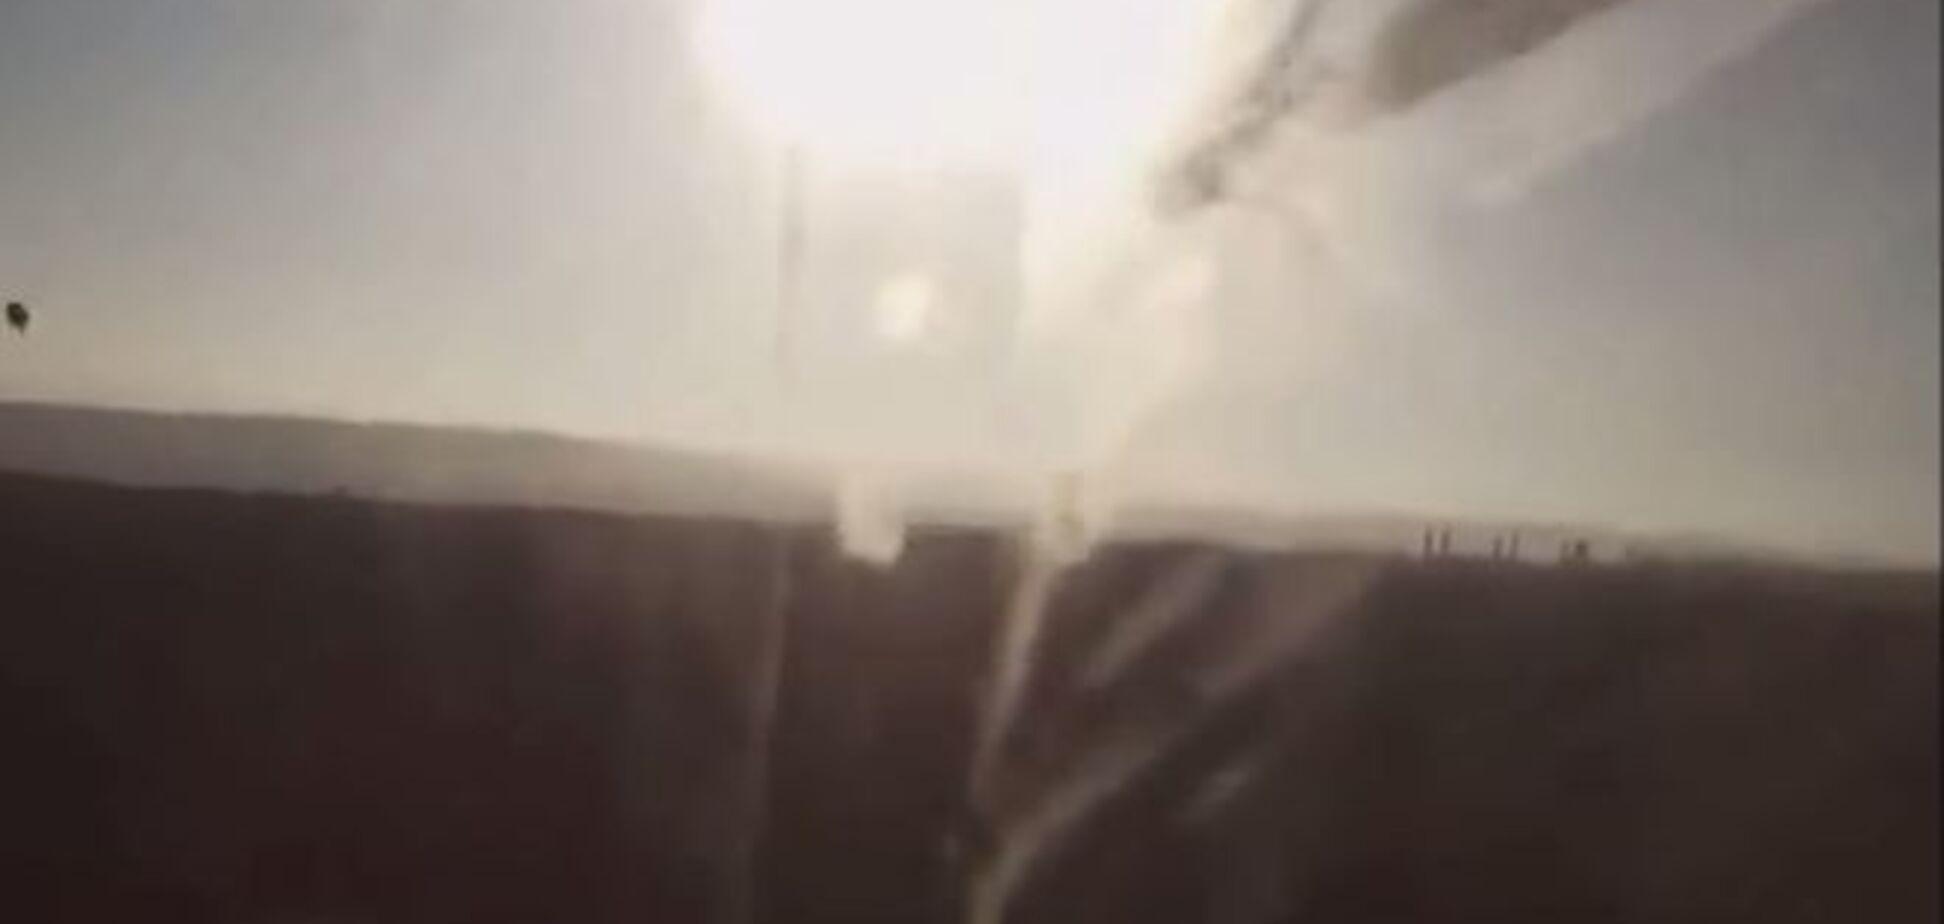 Опубликовано видео со сбитого на Донбассе вертолета